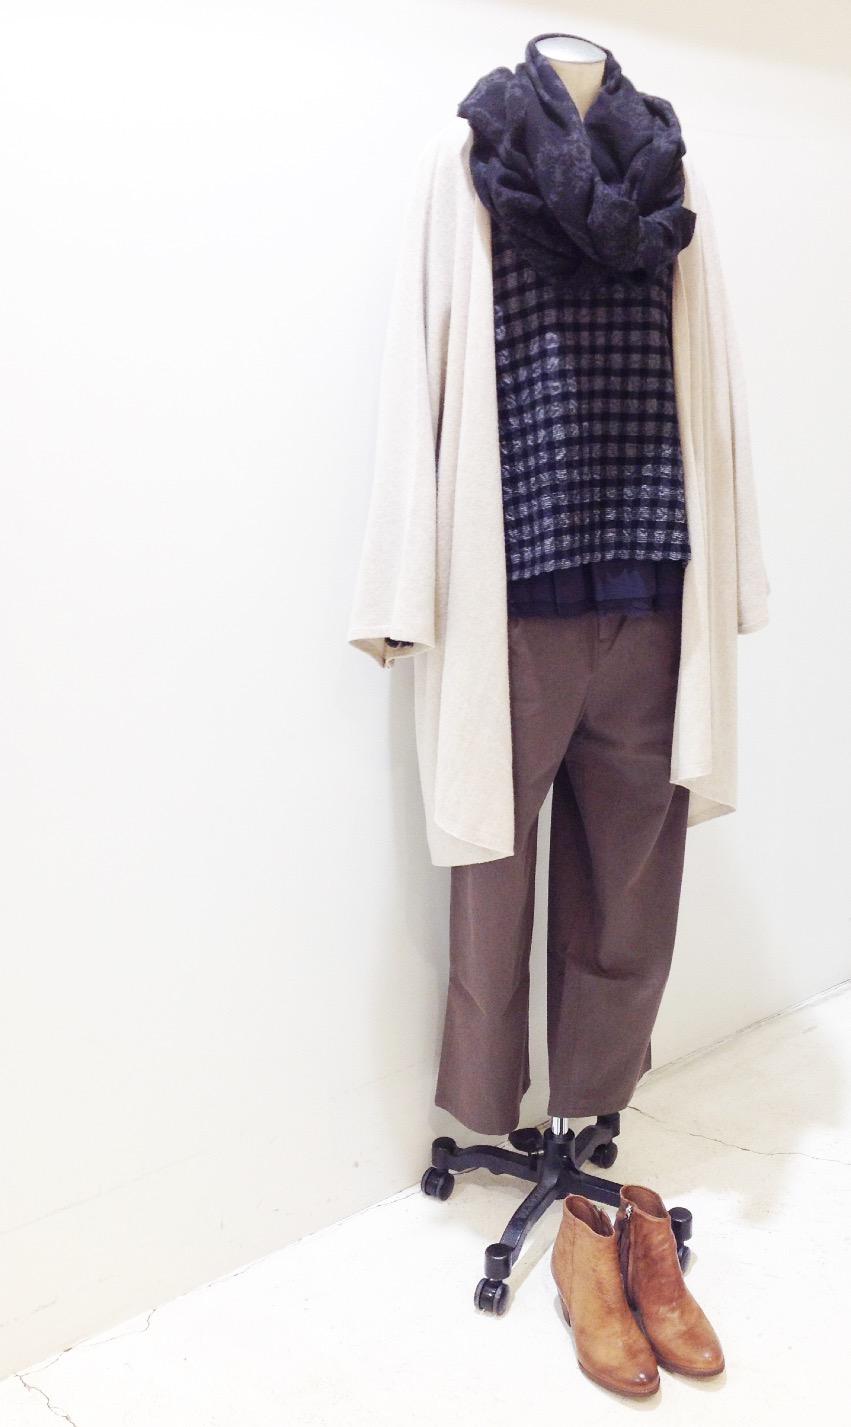 pas de calais【パドカレ】ドビーギンガムブラウス◆香川・綾川店